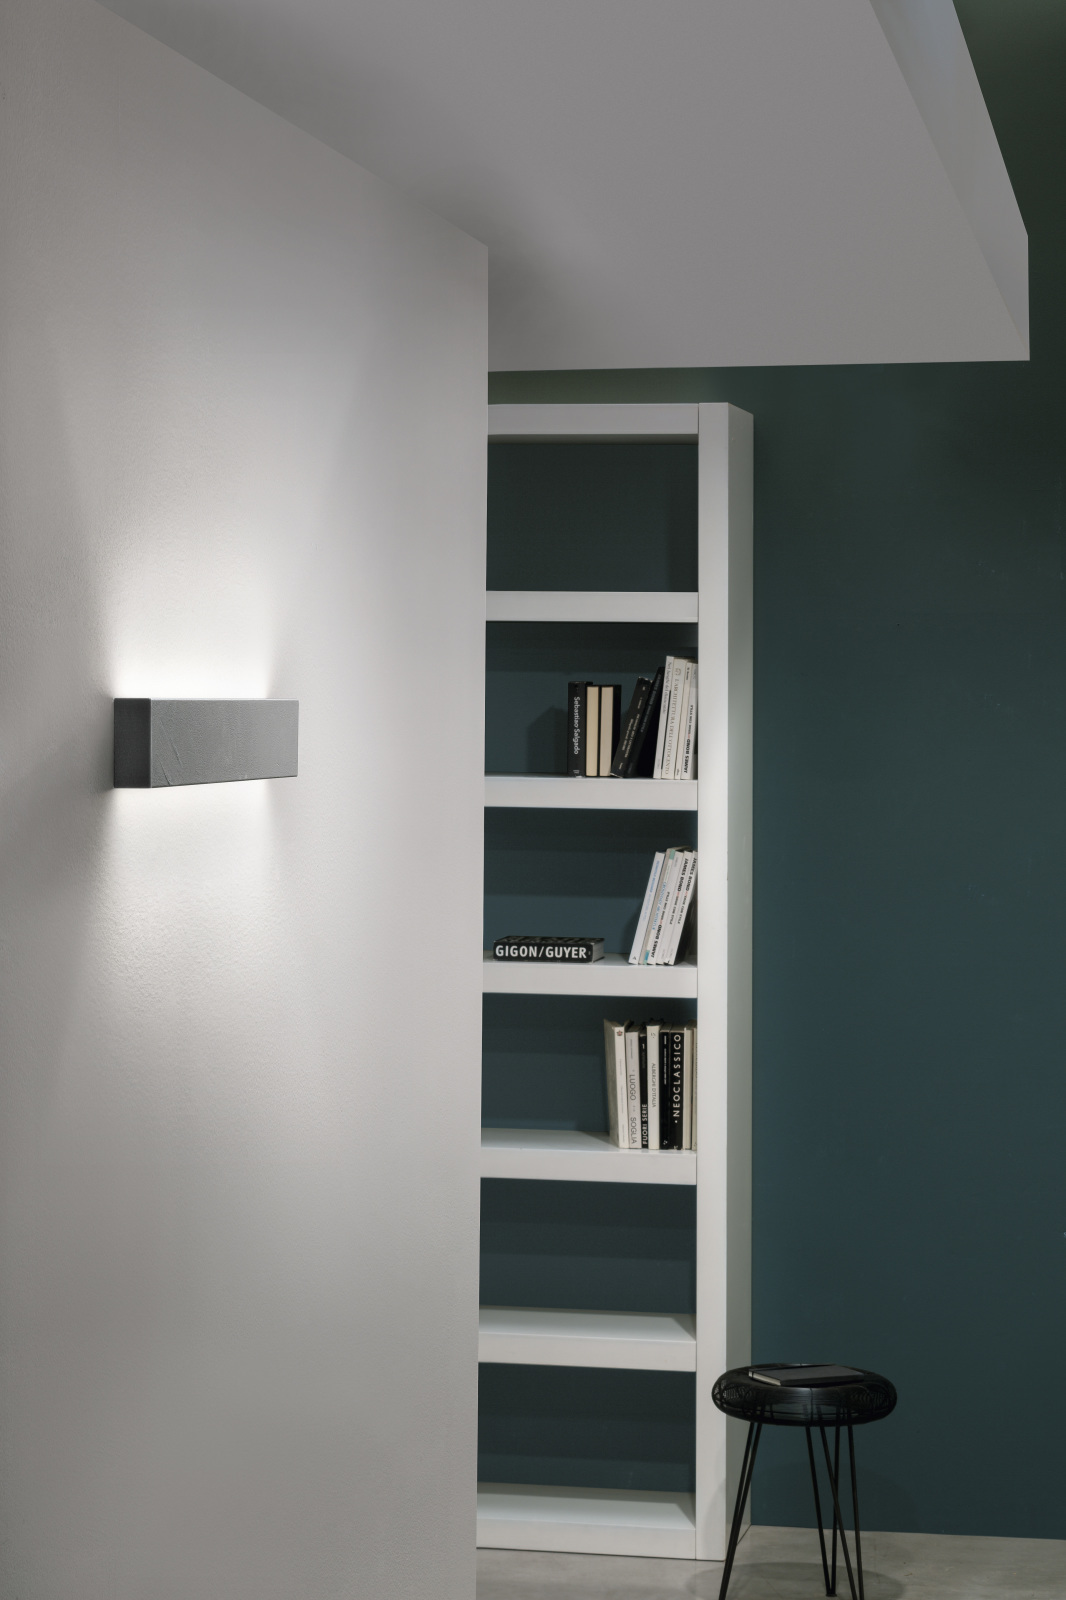 Linea Light Illuminazione.Wall Lights Box W2 Linea Light Group